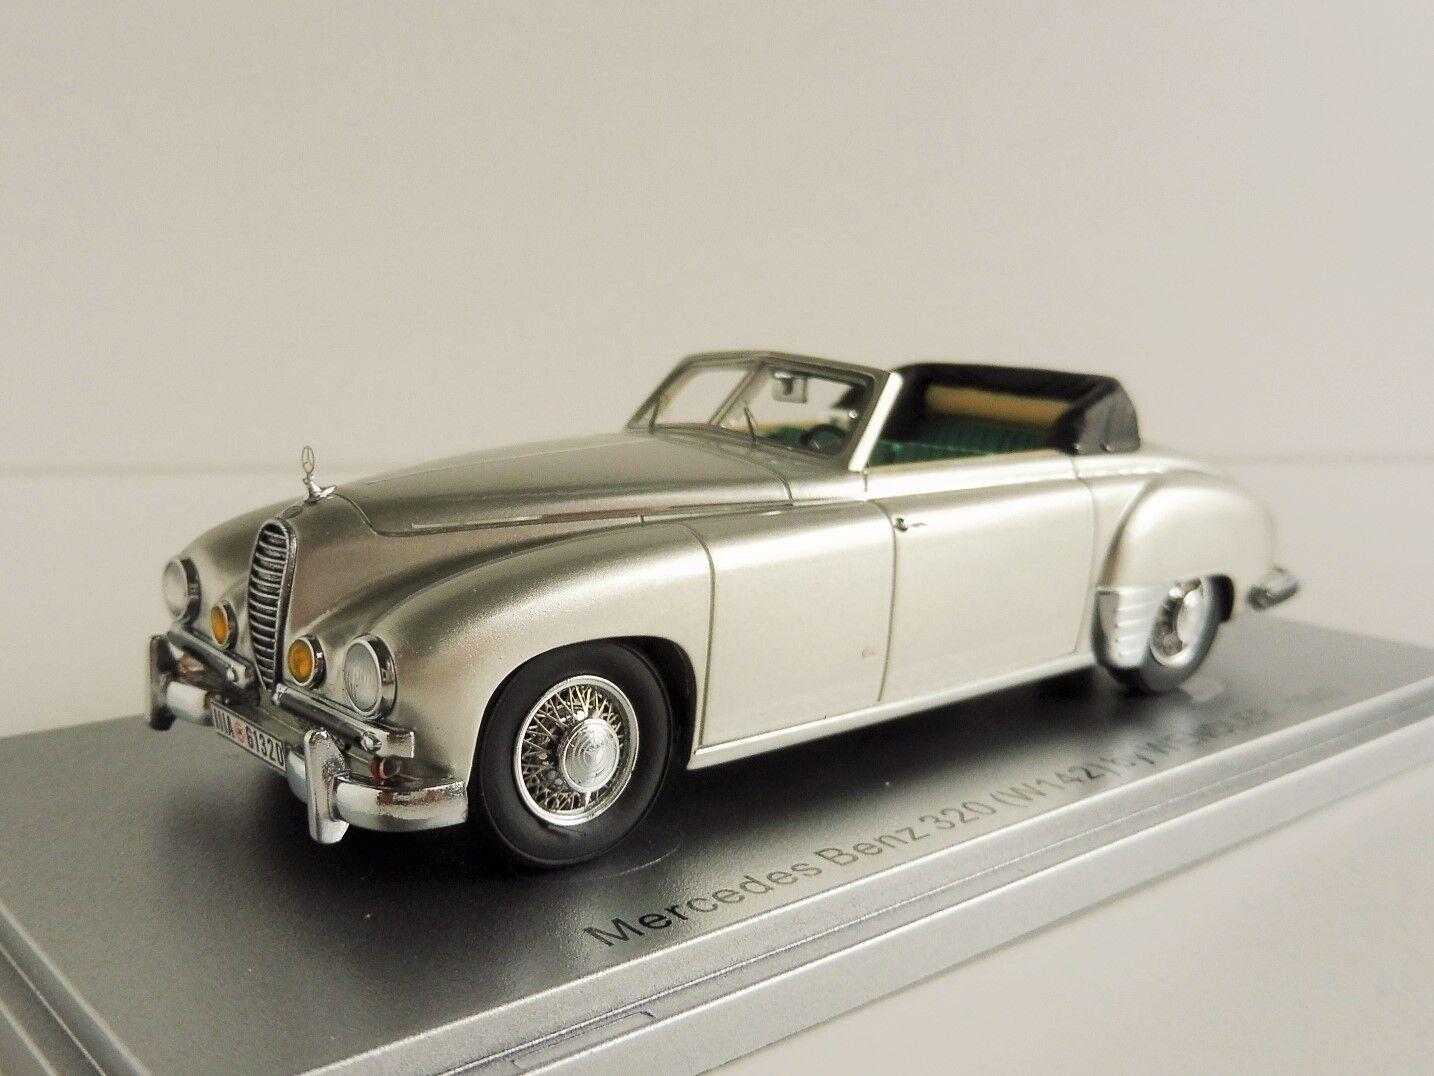 Mercedes-Benz 320 By Wendler Cabrio 1940 1 43 Kess Ke43037000 Mercedes